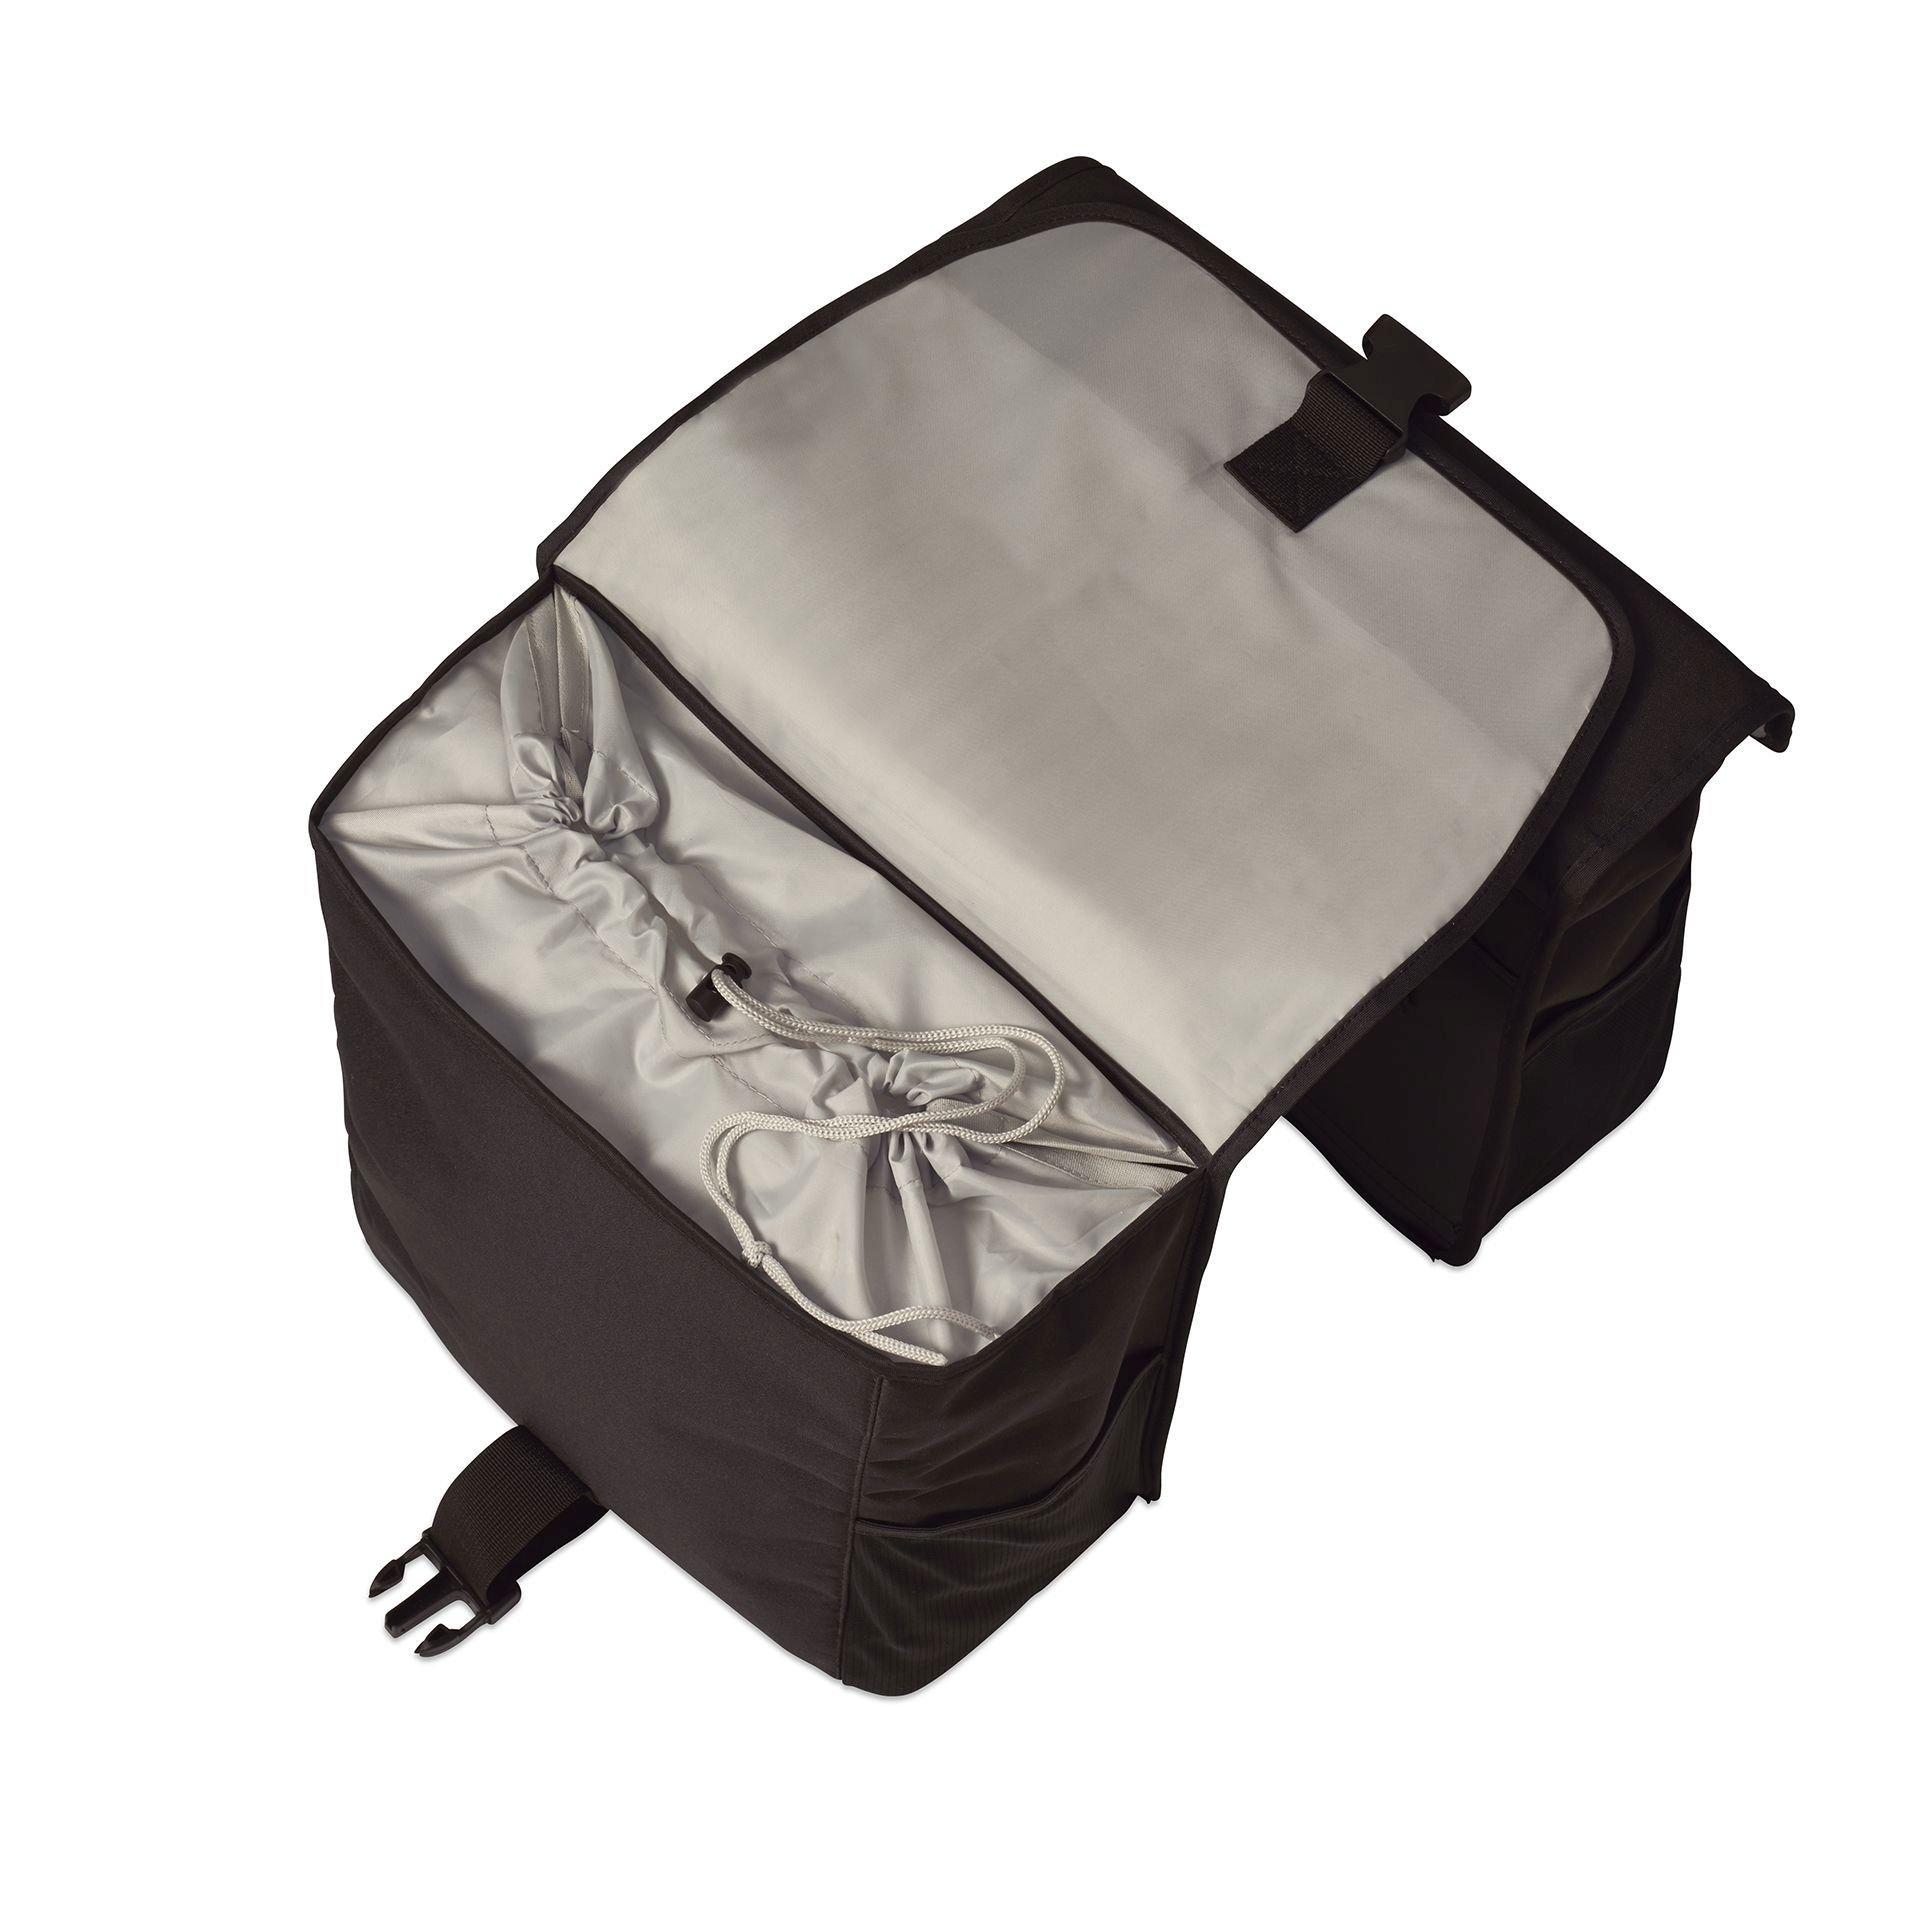 Basil GO Double Bag Geptr-Tasche, 32L